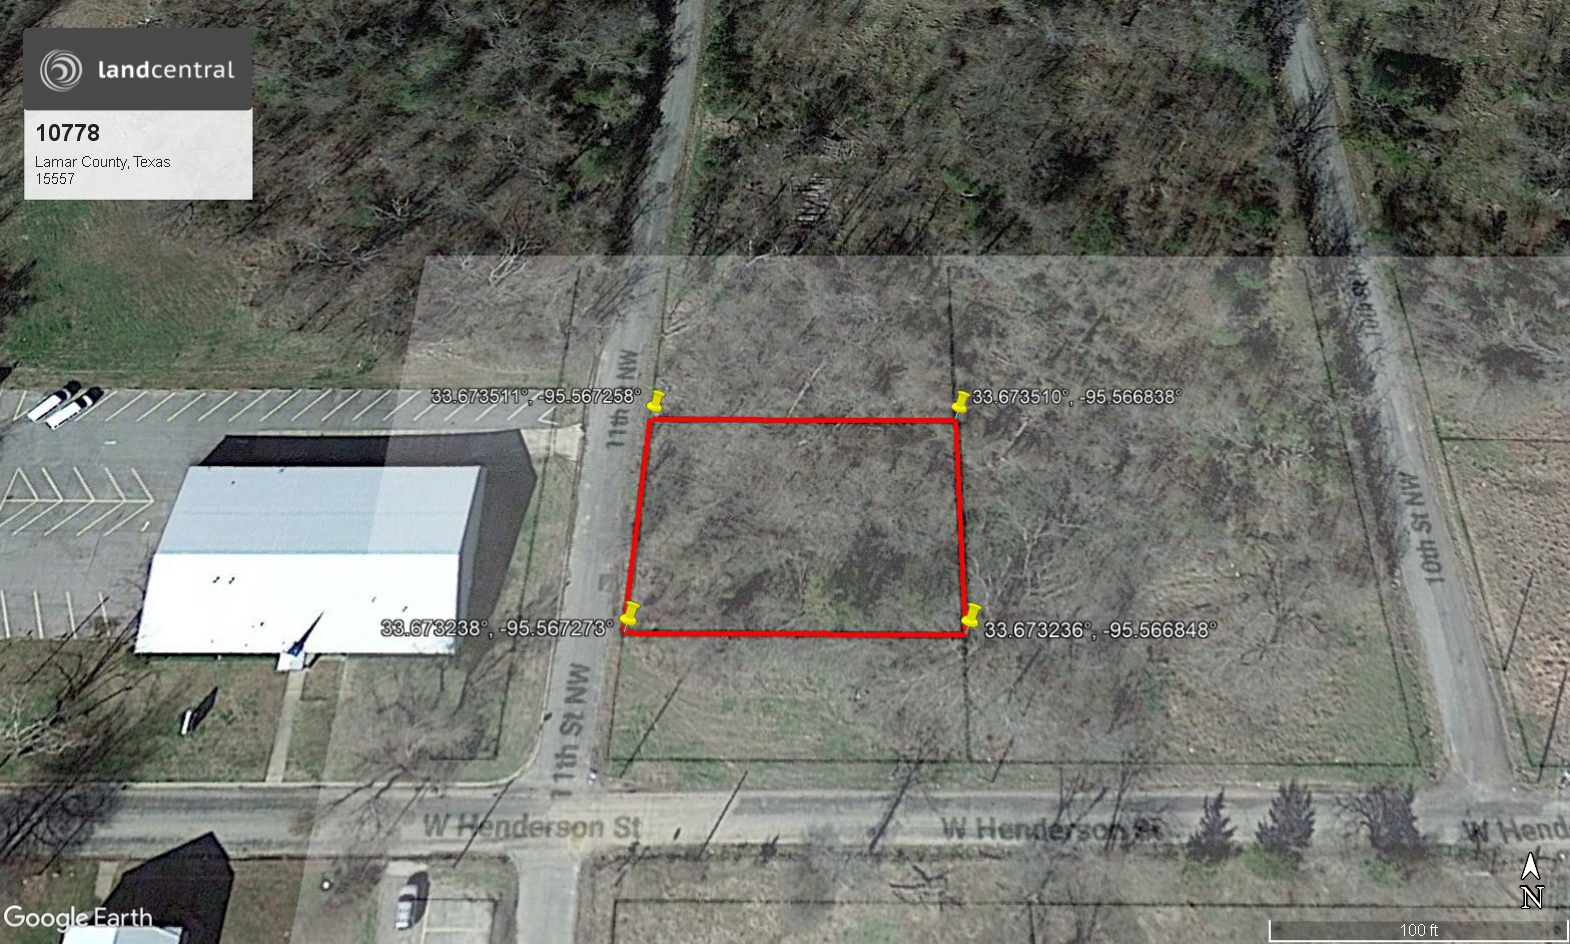 More than Quarter Acre of Prime Real Estate   LandCentral